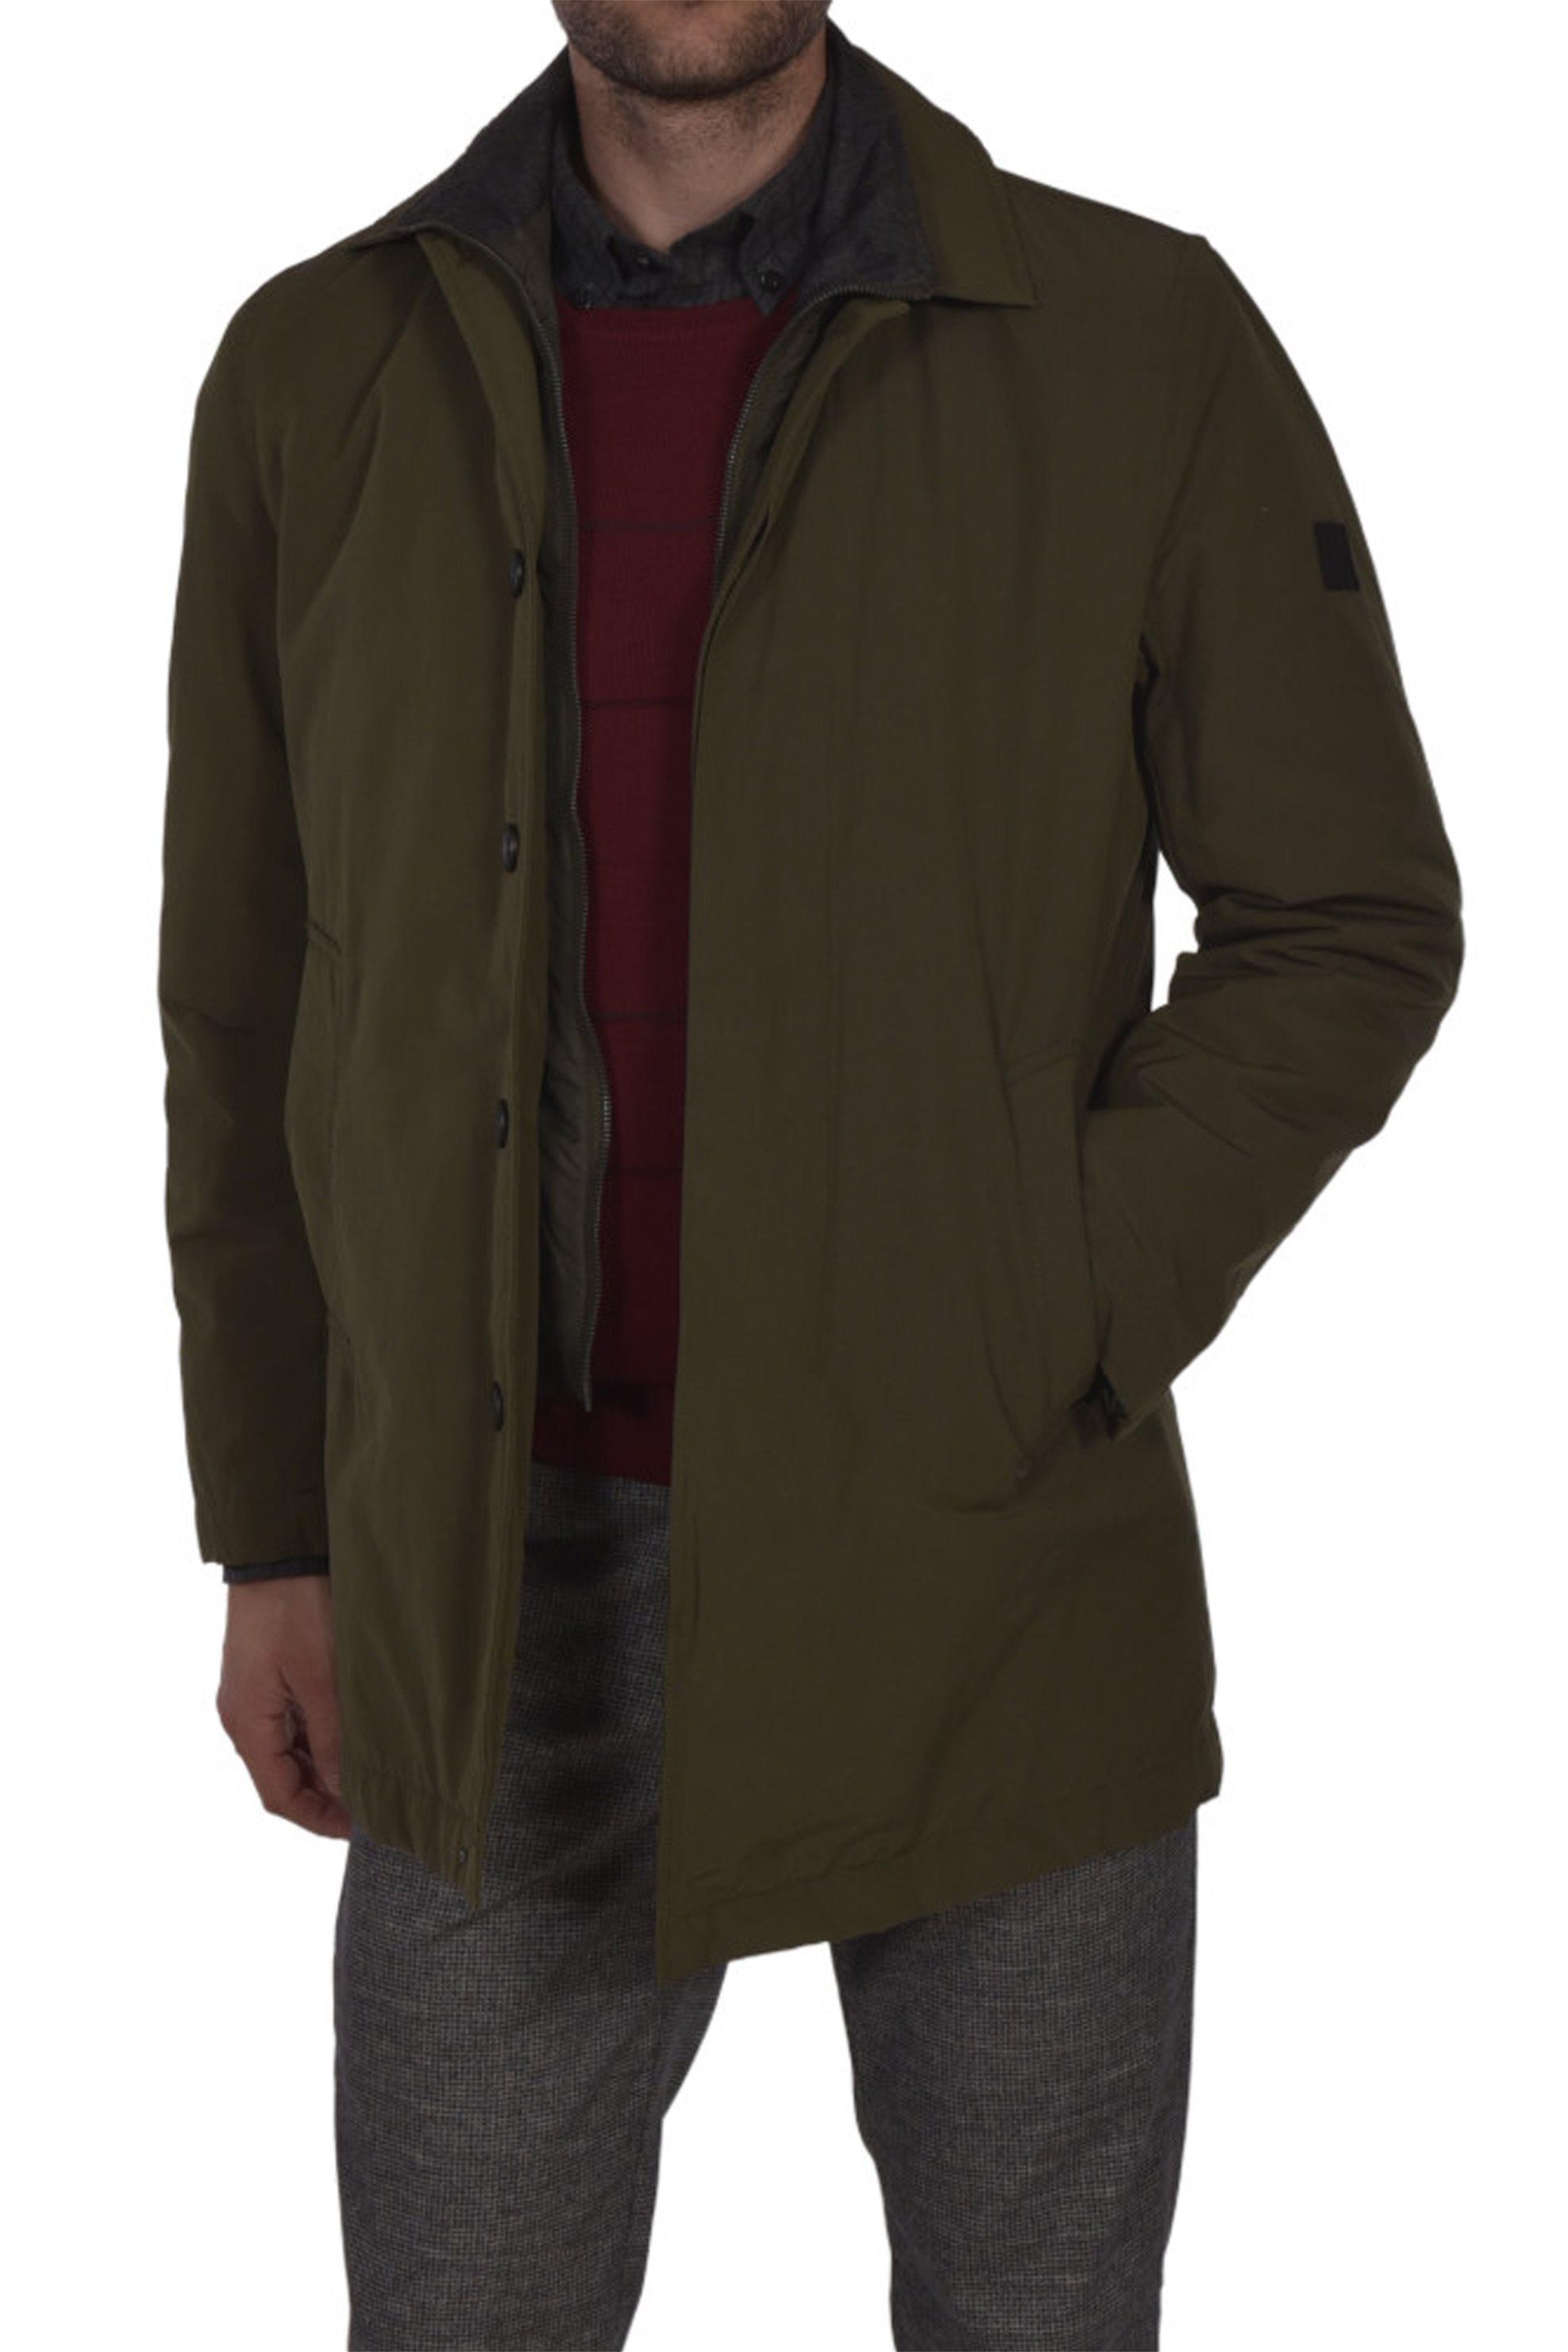 d7db9cc9db76 Notos Dur ανδρικό παλτό καμπαρντίνα με φερμουάρ και κουμπιά - 50210307 -  Λαδί